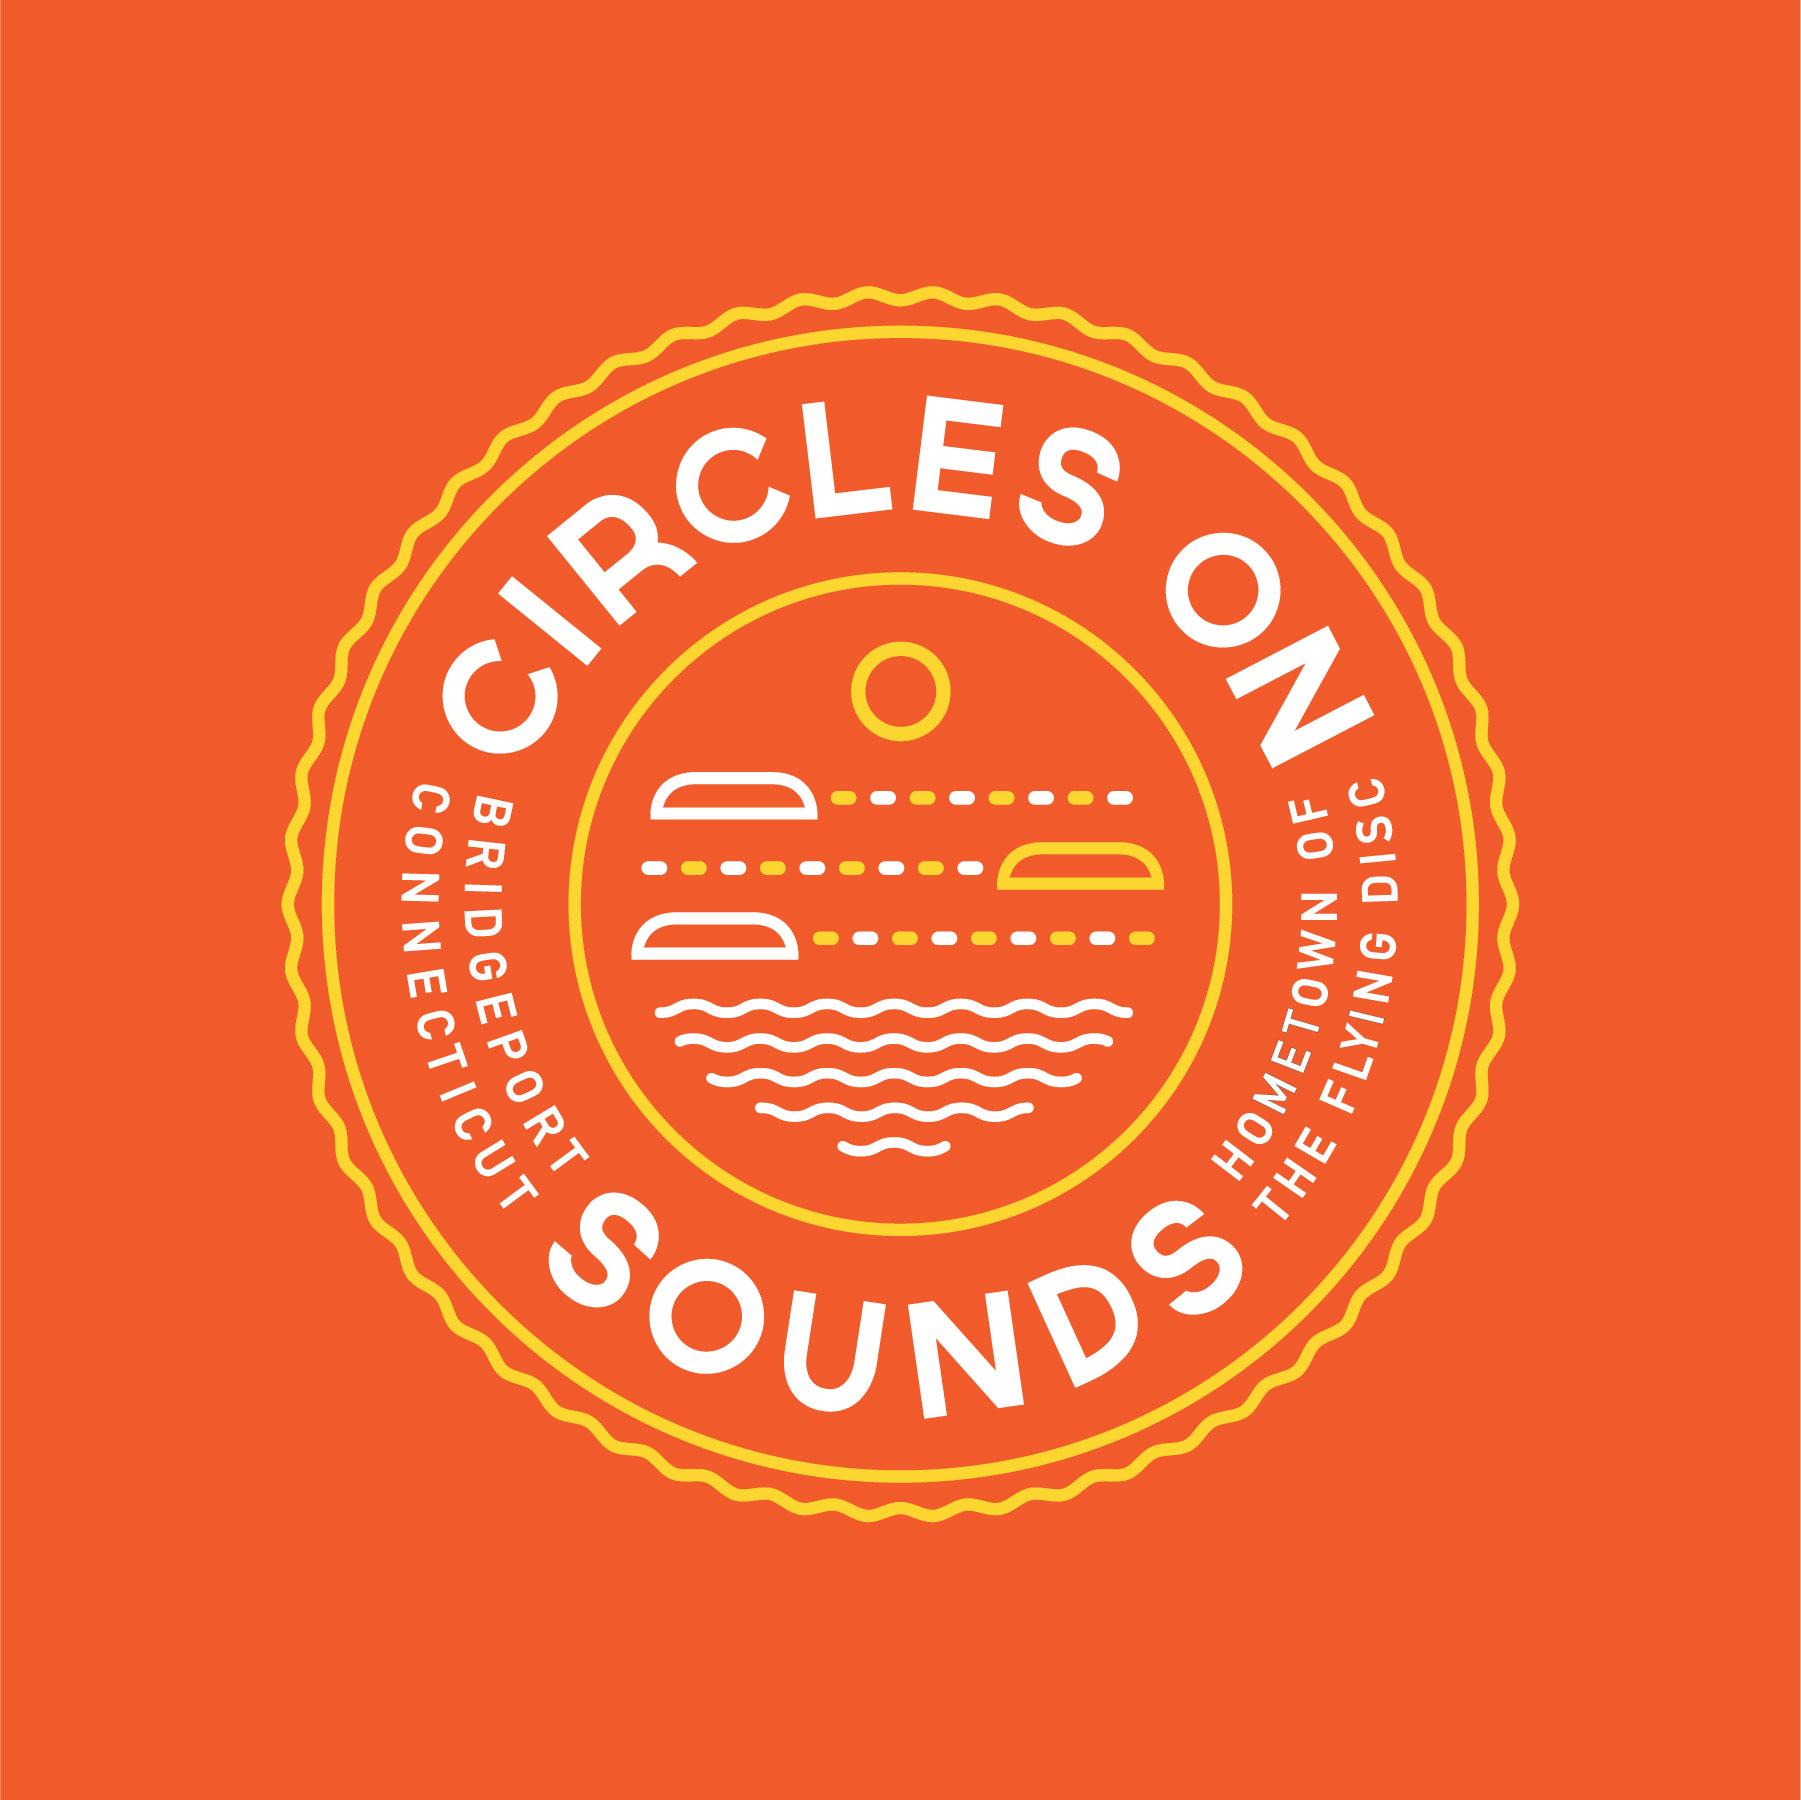 logo_circlesOnSounds.jpg